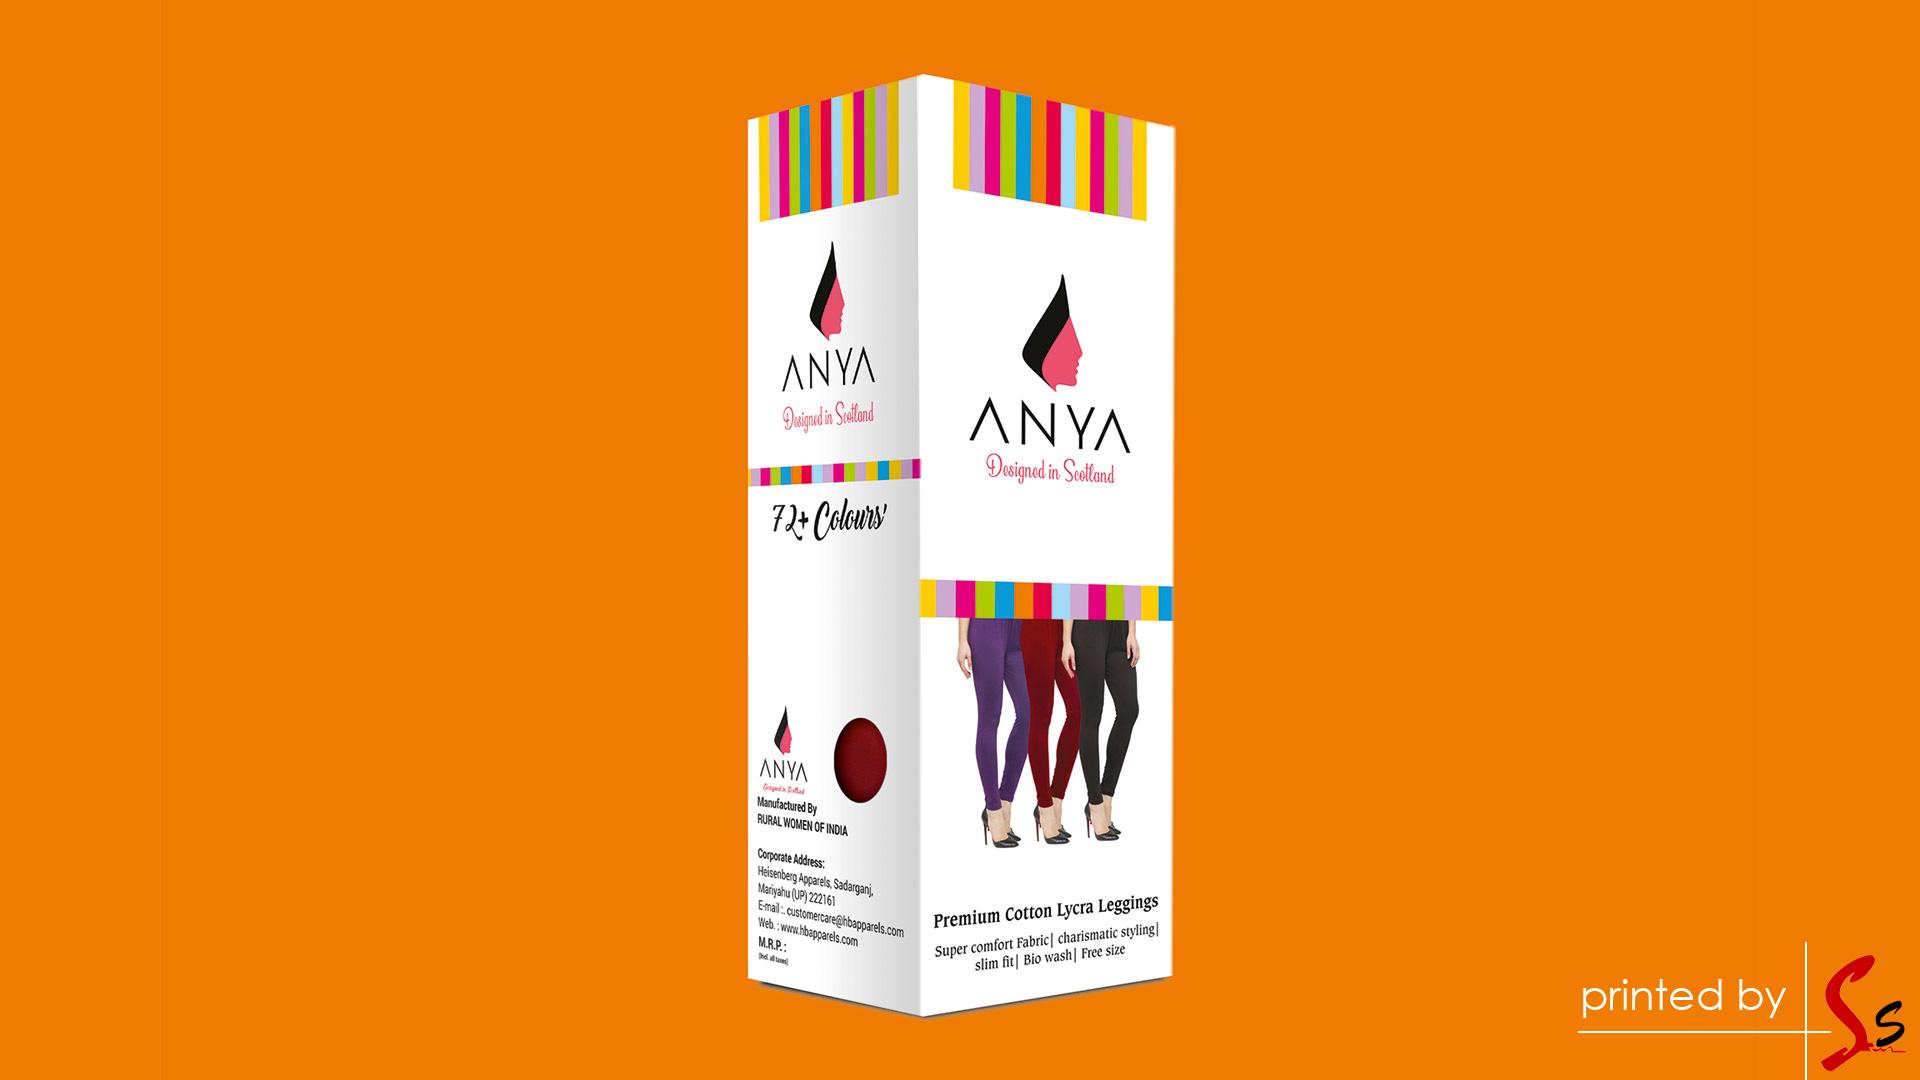 Anya Box